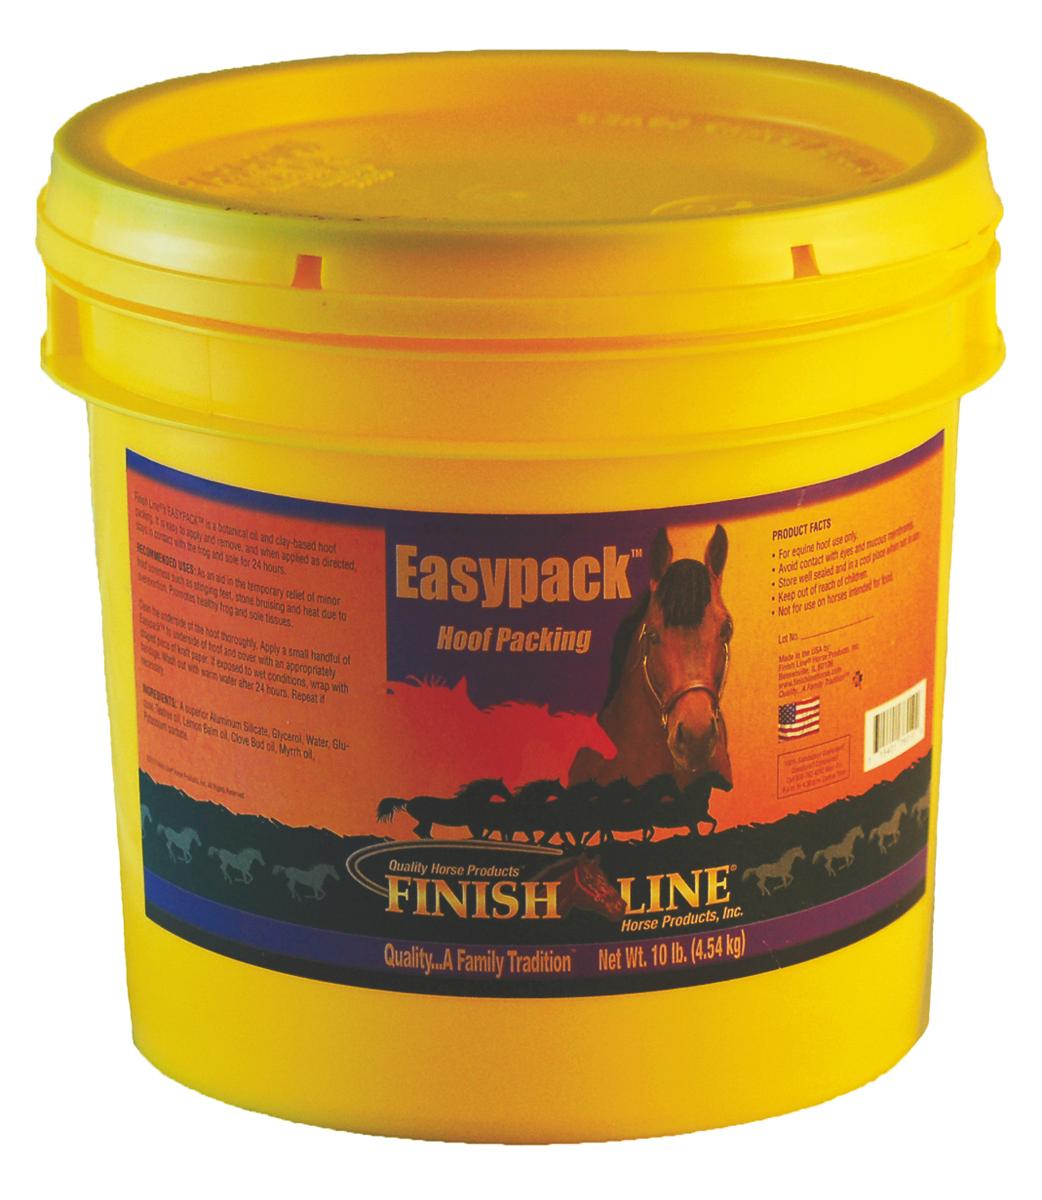 Finish Line Easypack Hoof Packing